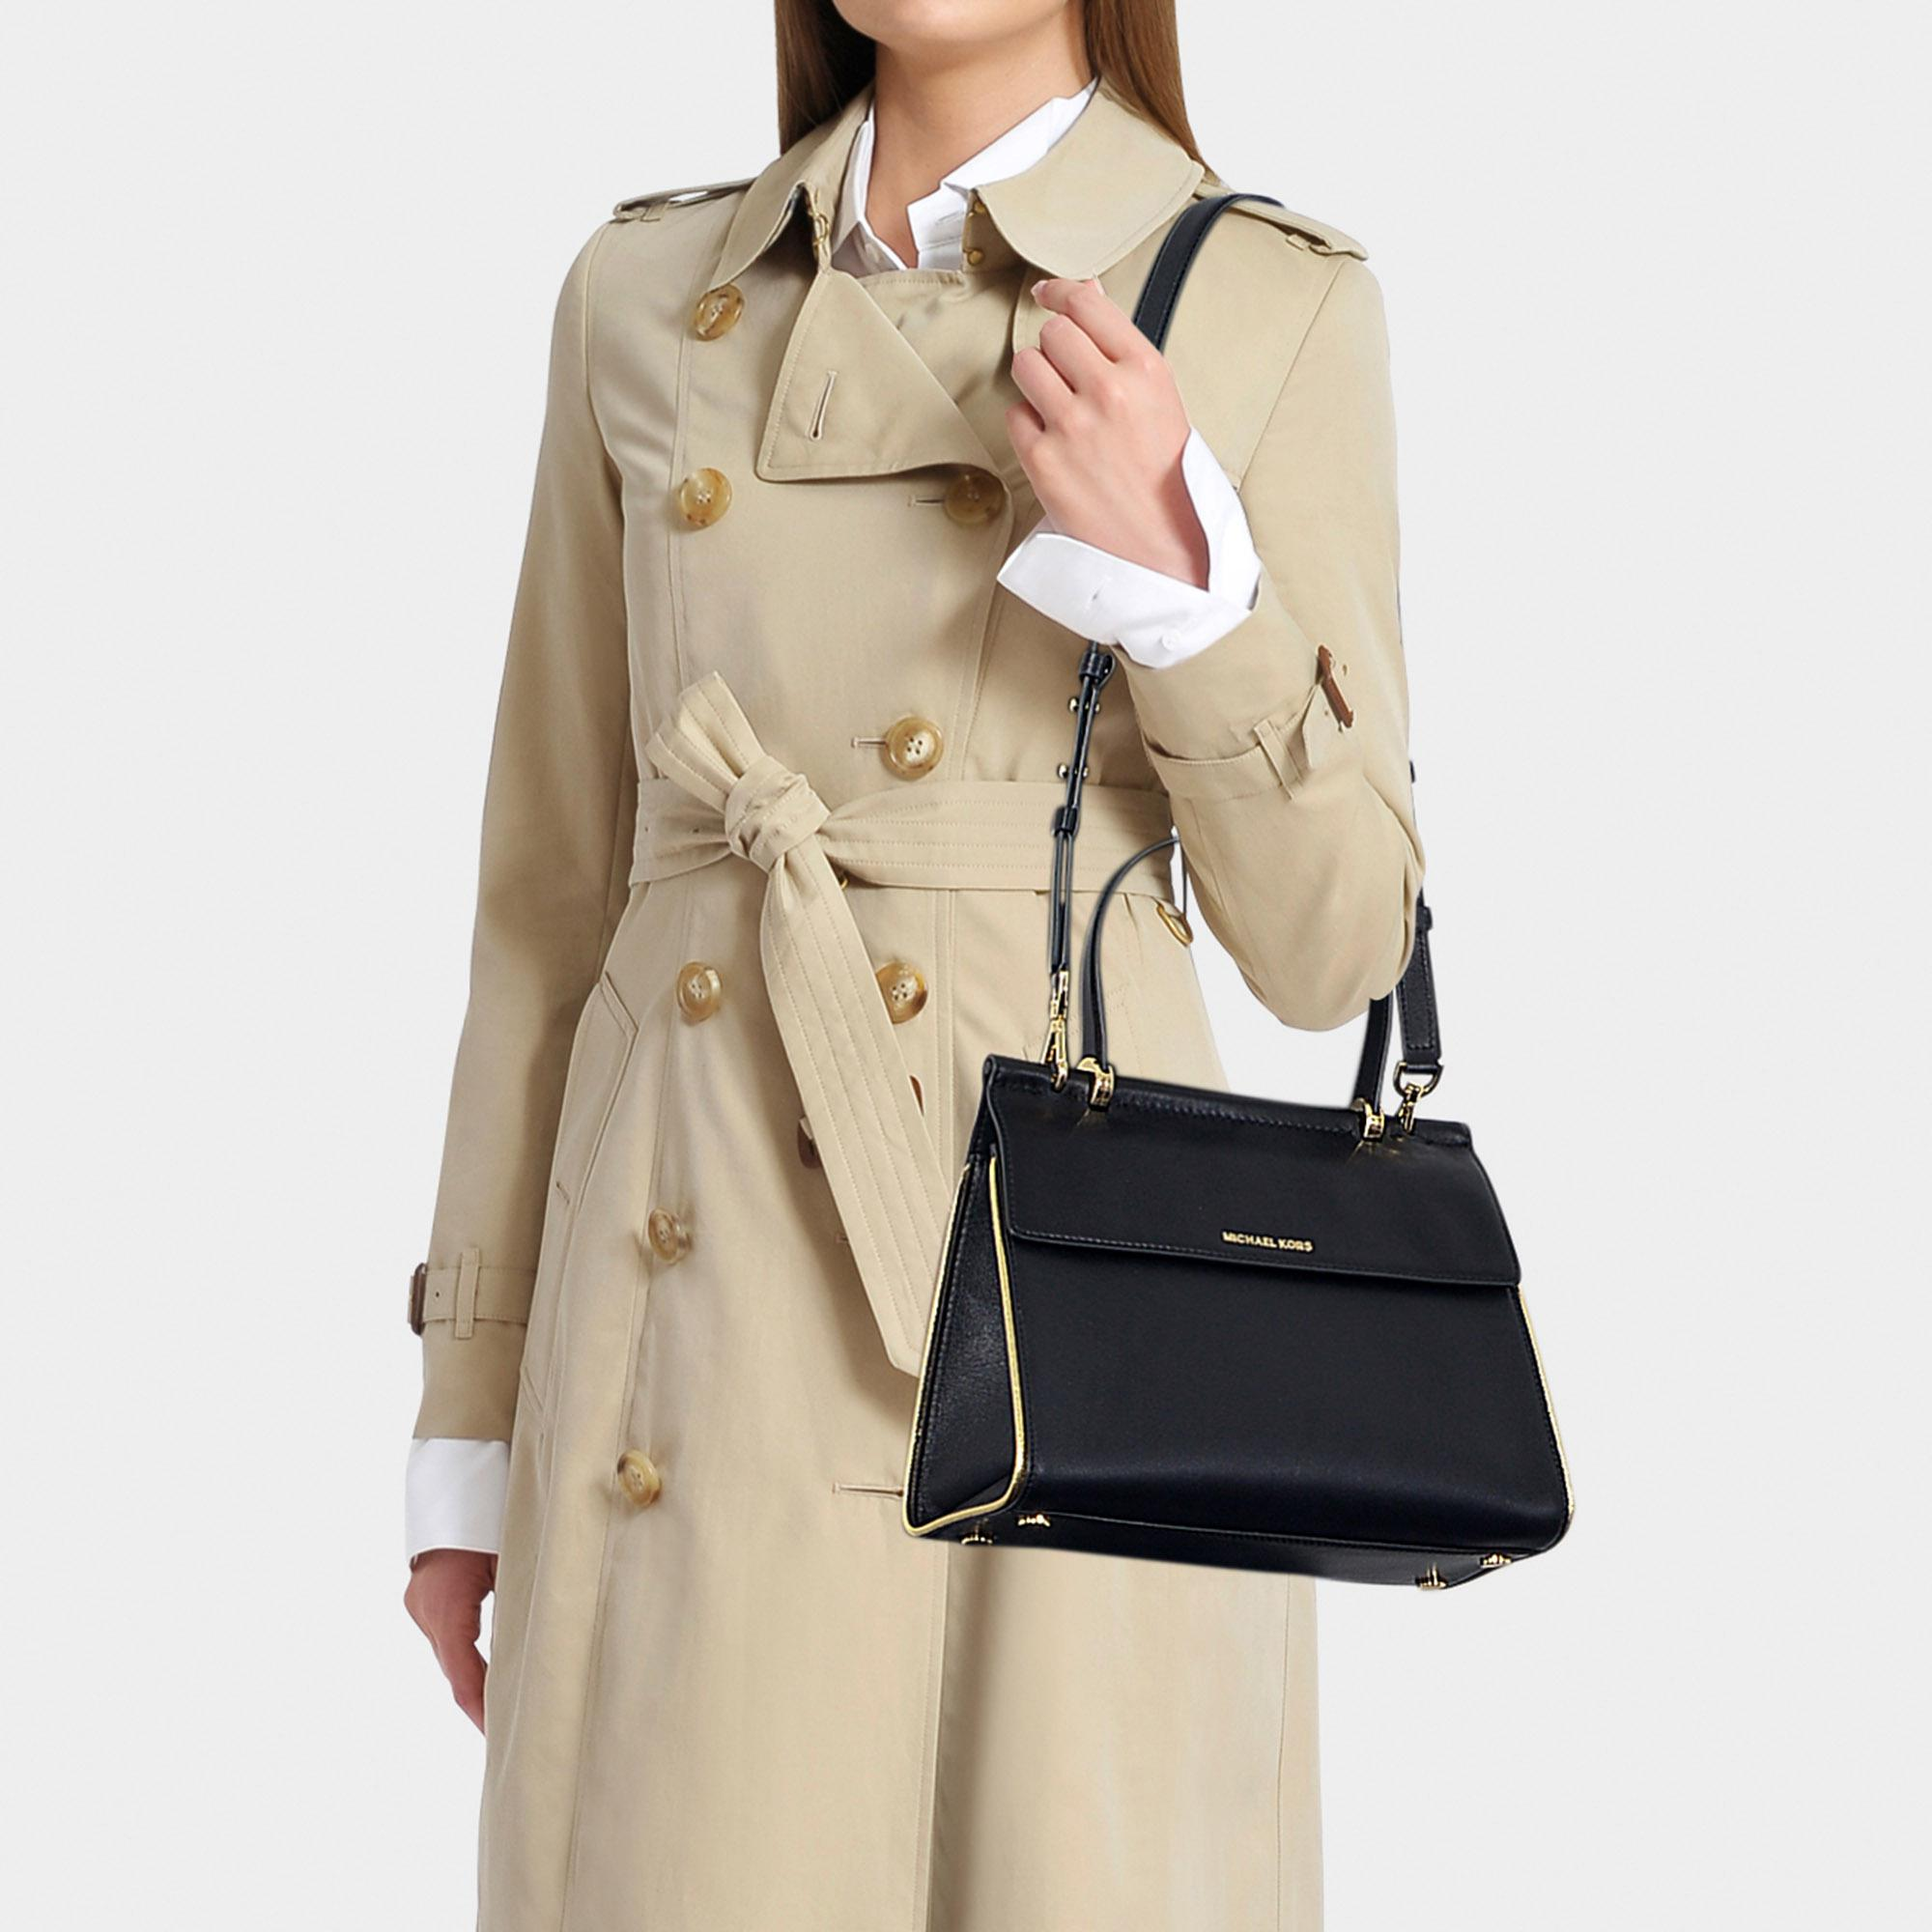 MICHAEL Michael Kors - Jasmine Medium Top Handle Satchel Bag In Black And  Gold Calfskin -. View fullscreen 0eb9e22c5e36c